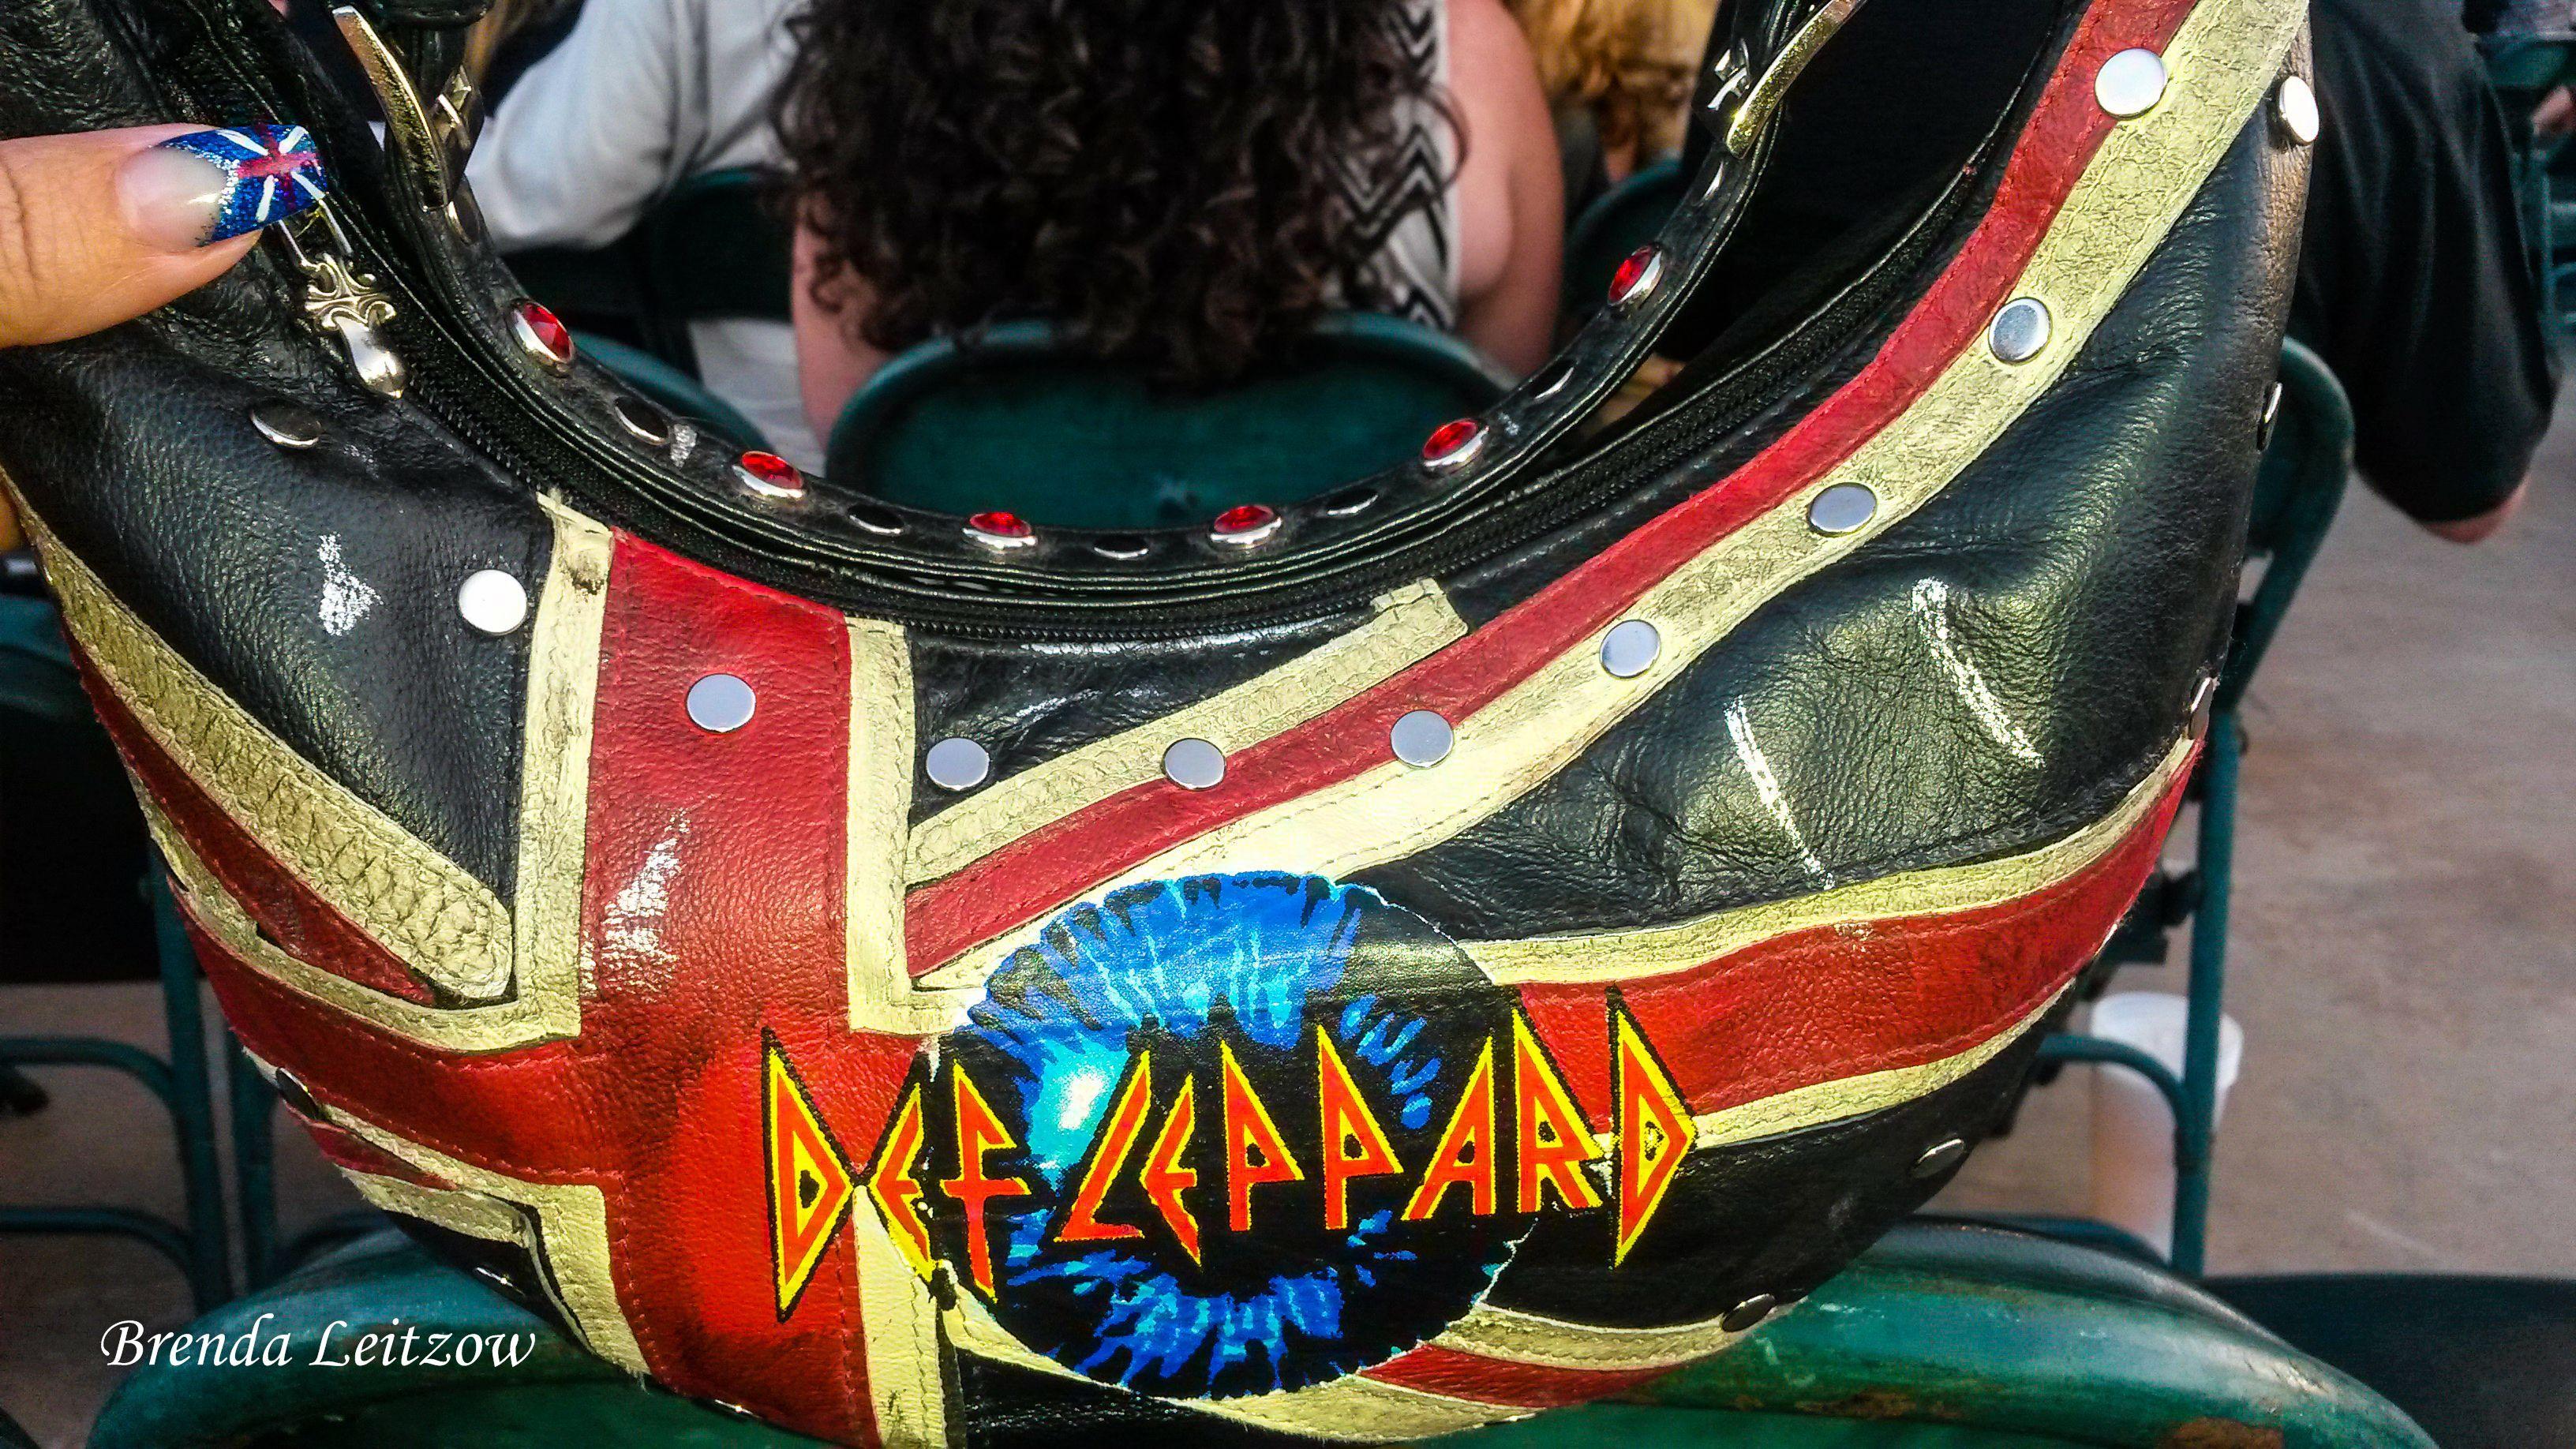 Wilson's Leather Def Leppard purse. purseddef Trendy